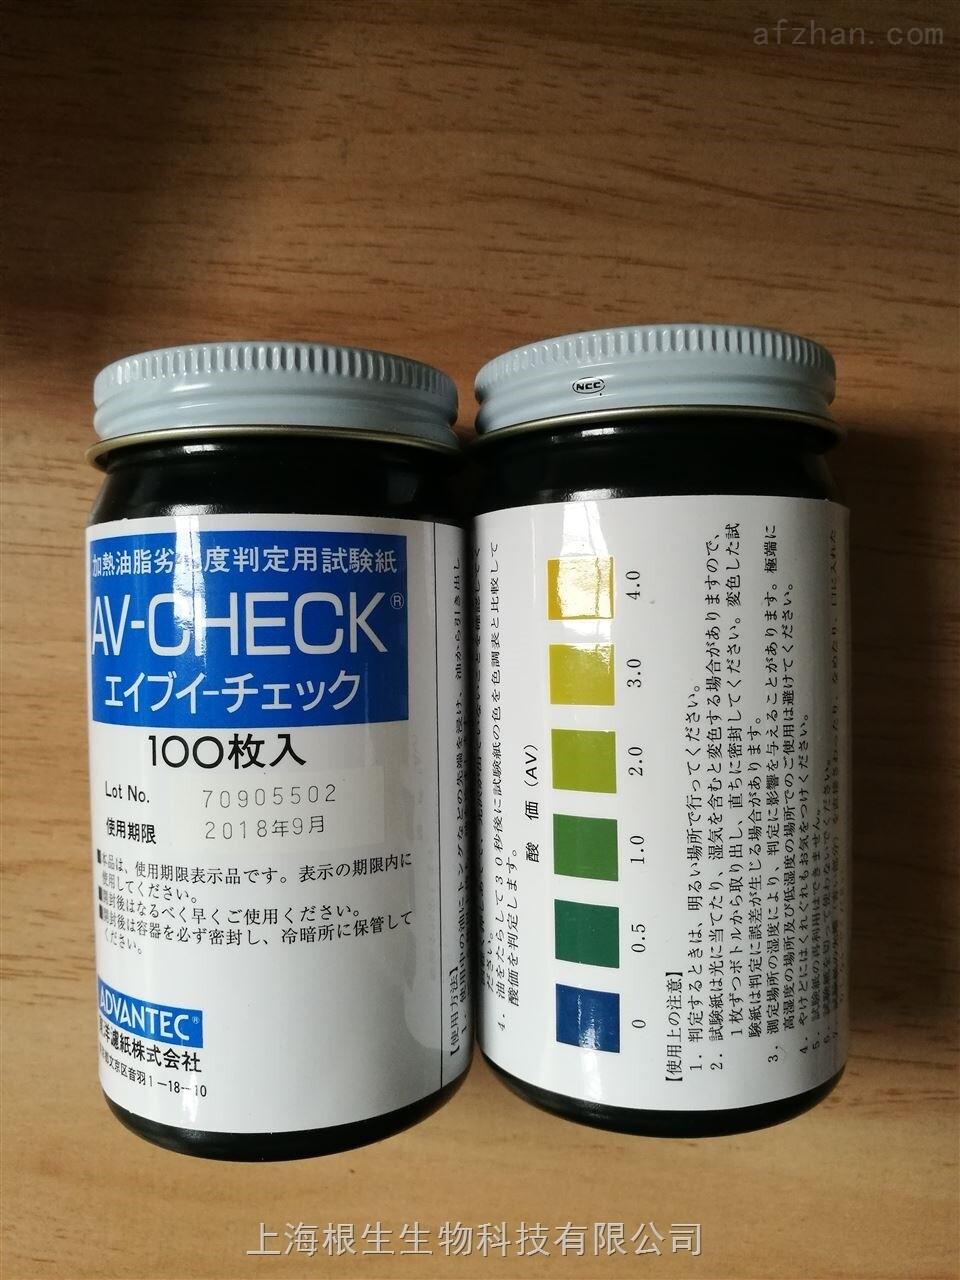 ADVANTEC AV-CHECK加热油脂劣化度测油试纸